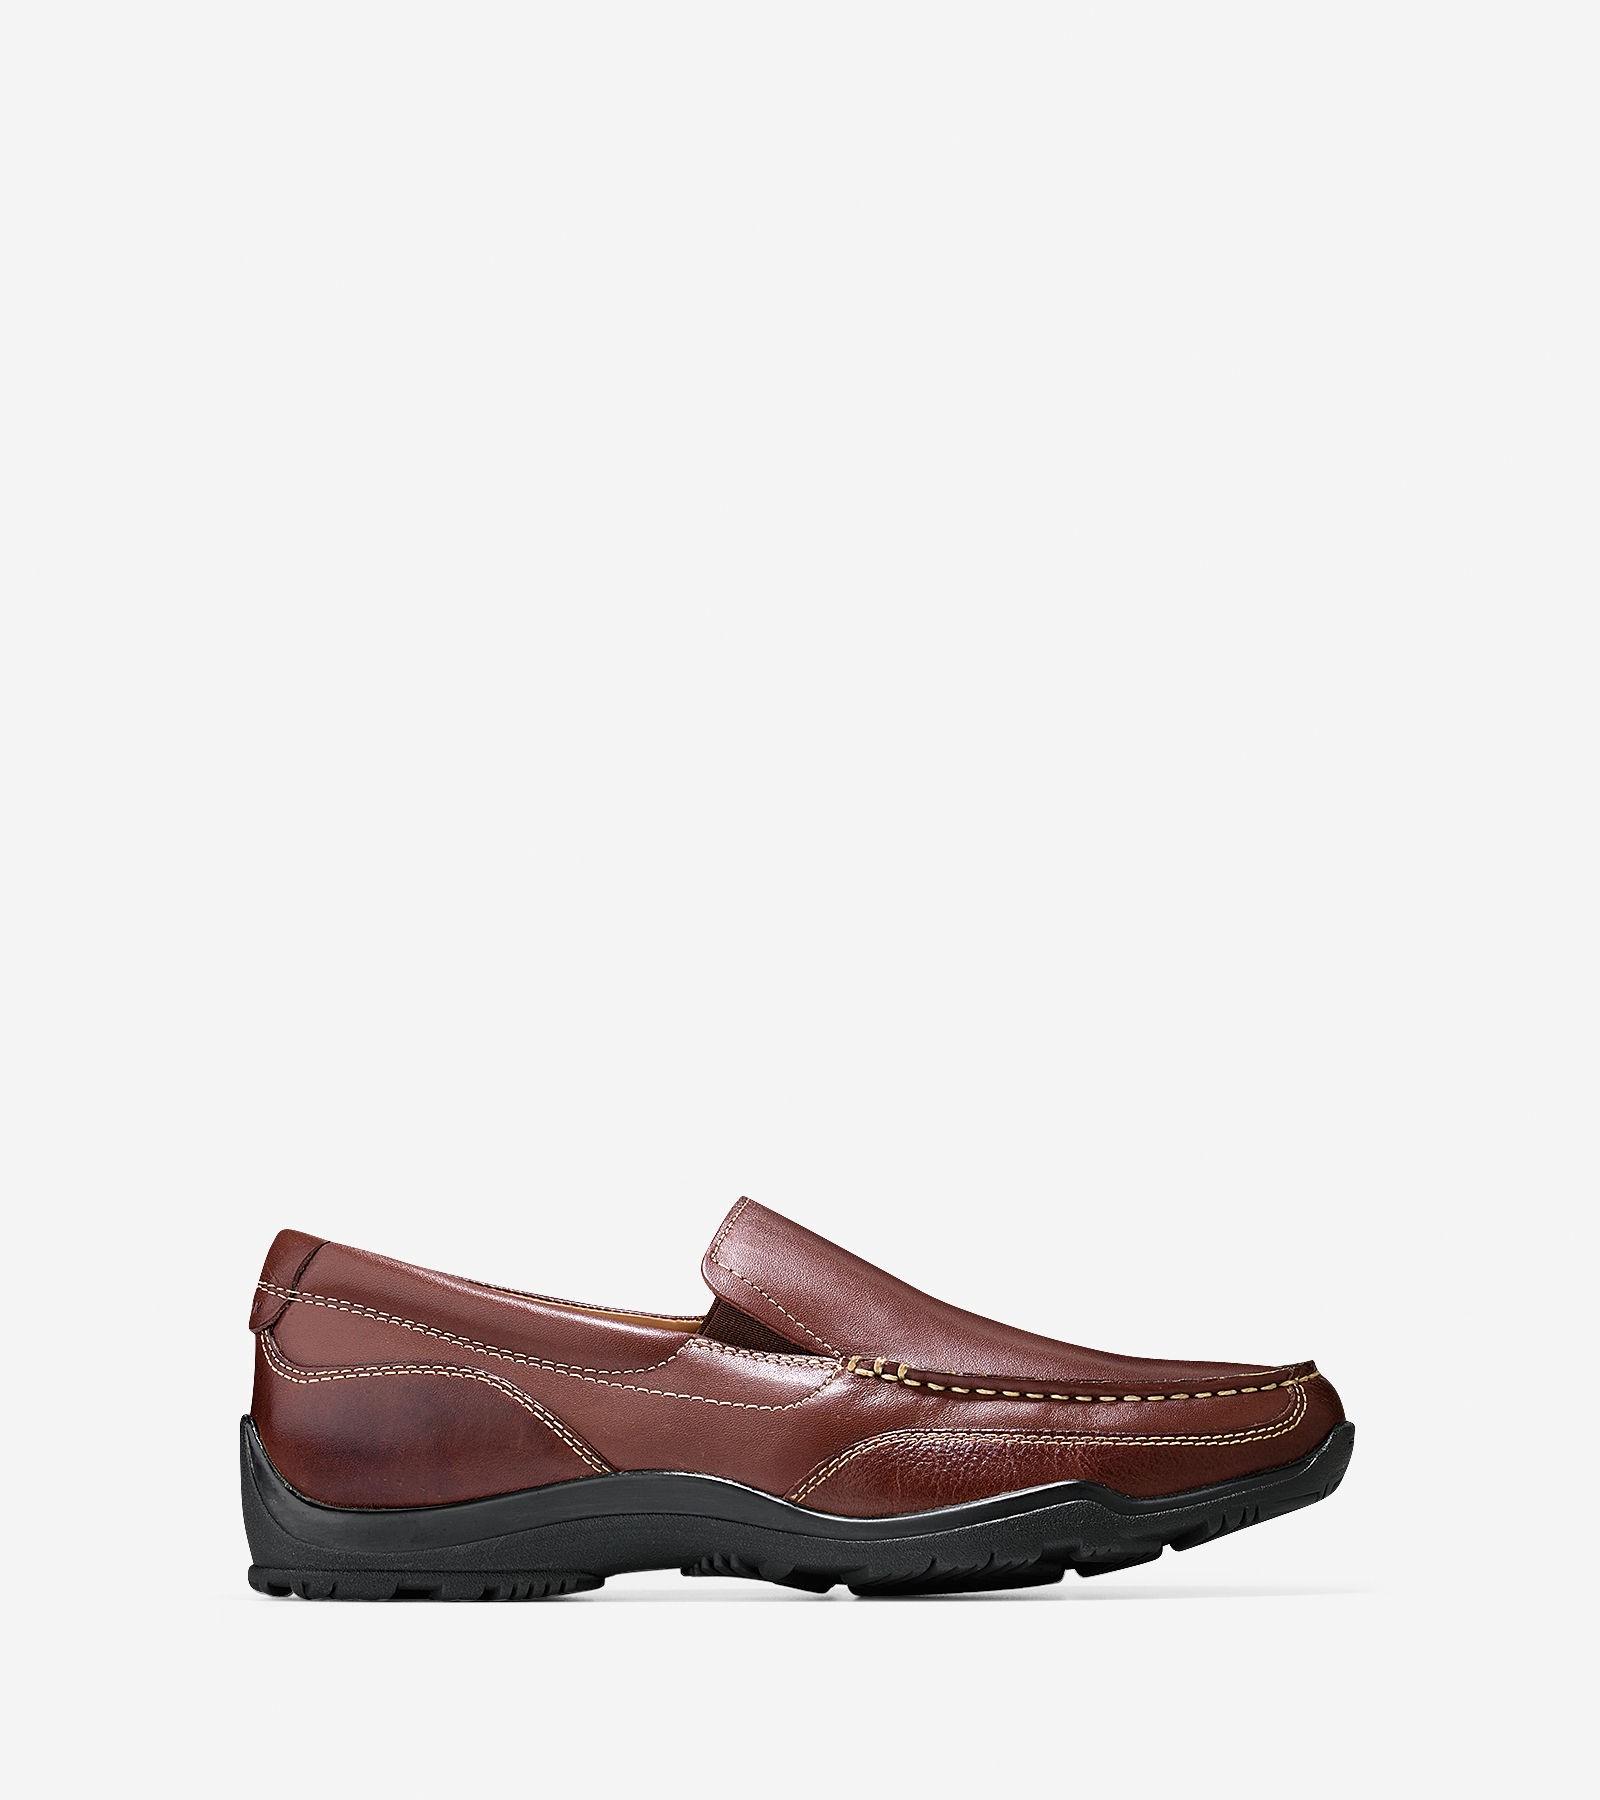 Cole Haan Hughes Grand Venetian Loafer